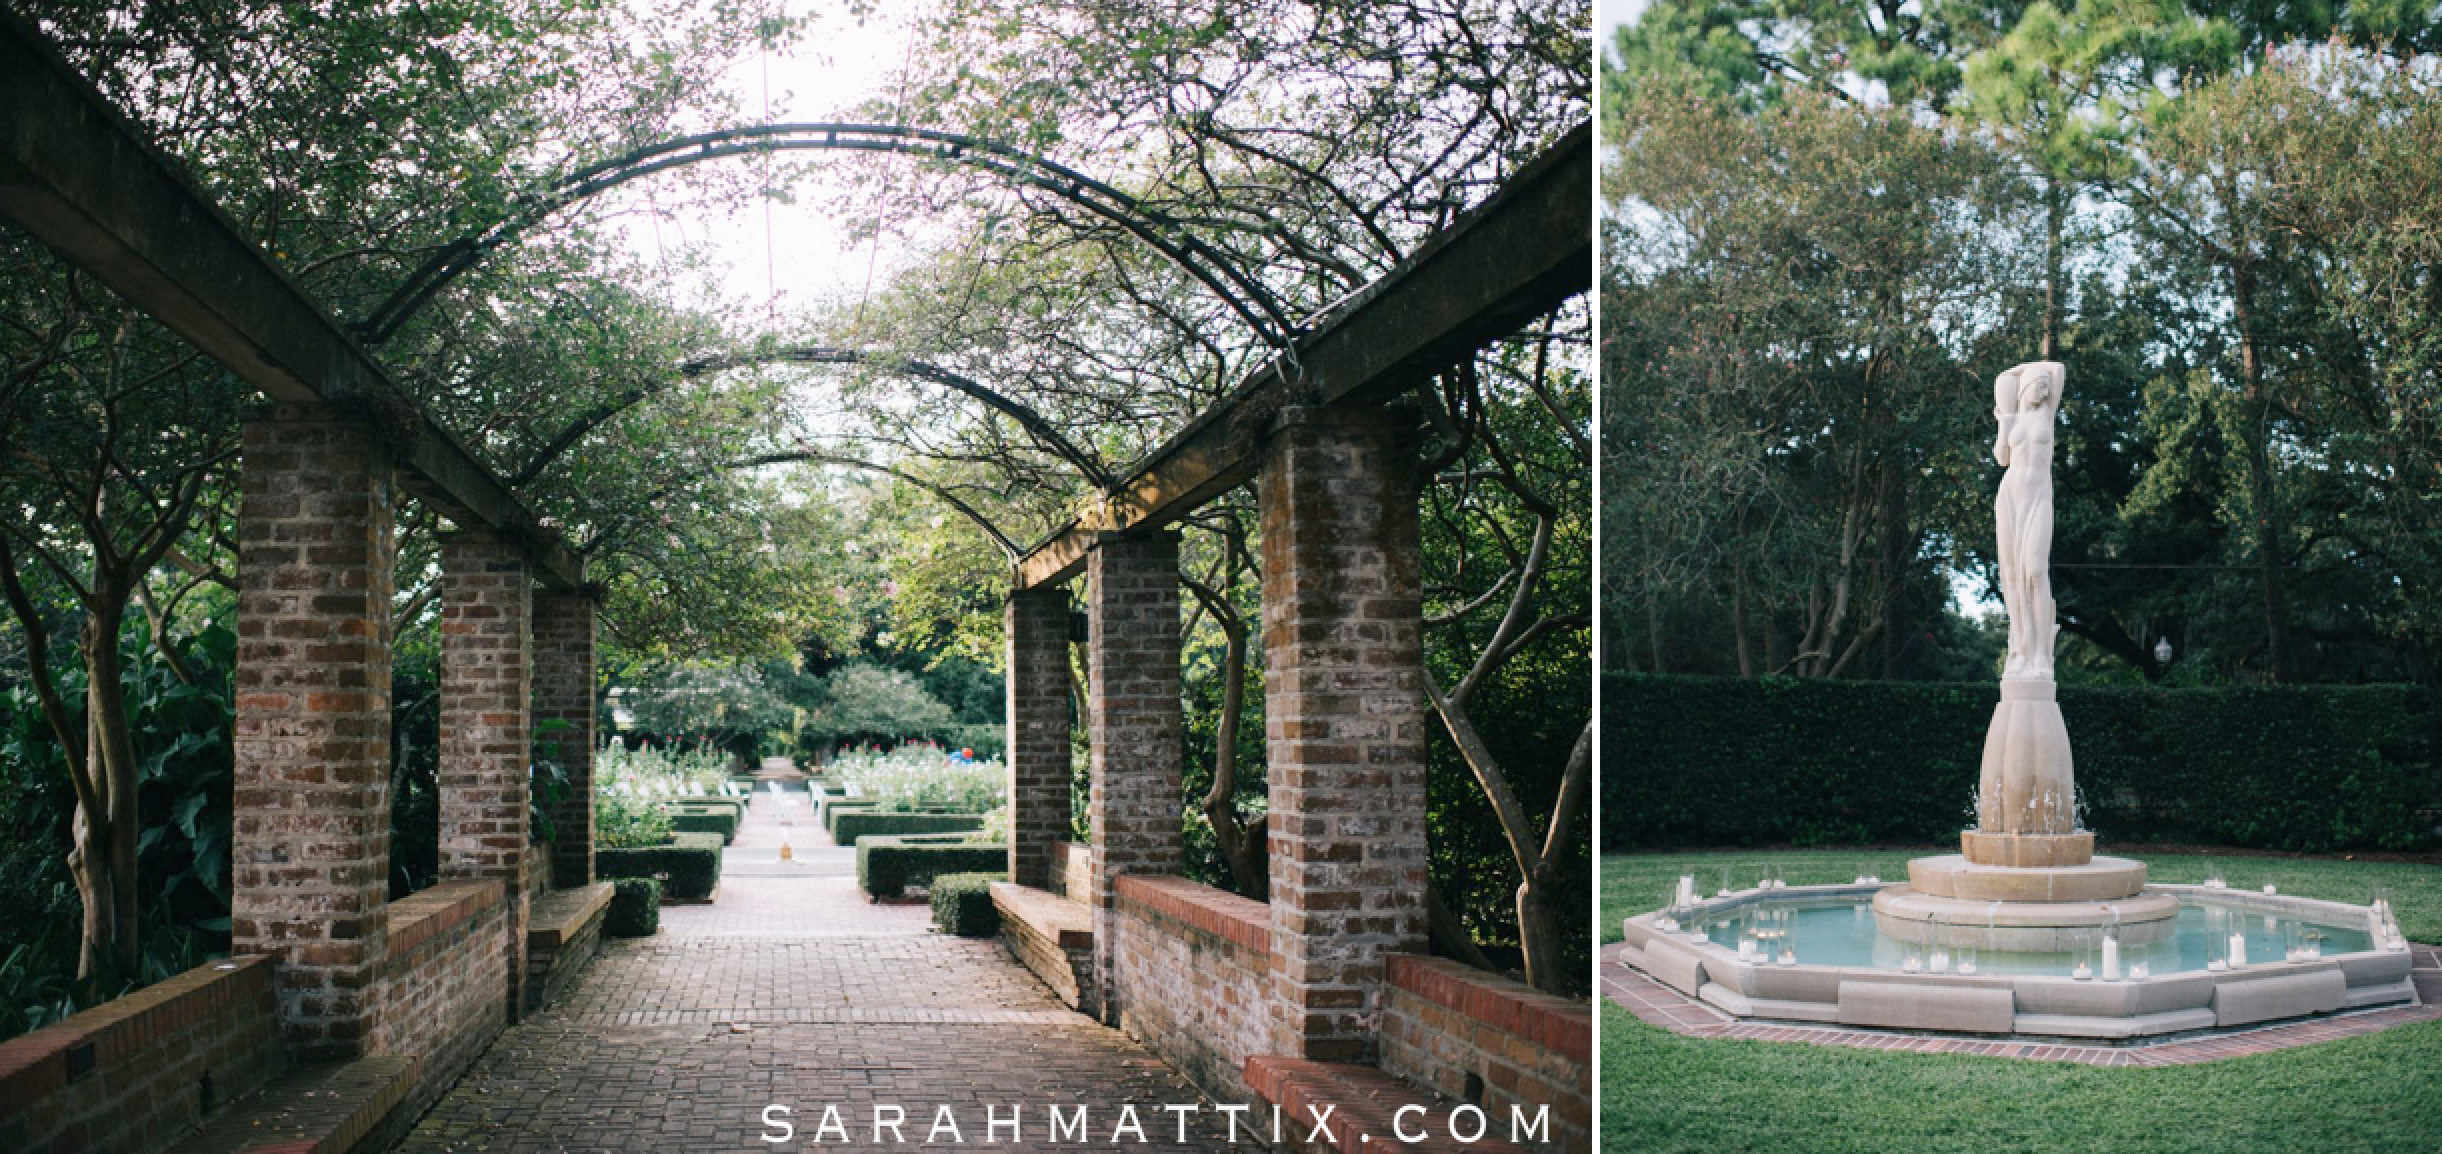 Lauren Cage New Orleans Botanical Garden Wedding New Orleans Wedding Photographer Sarah